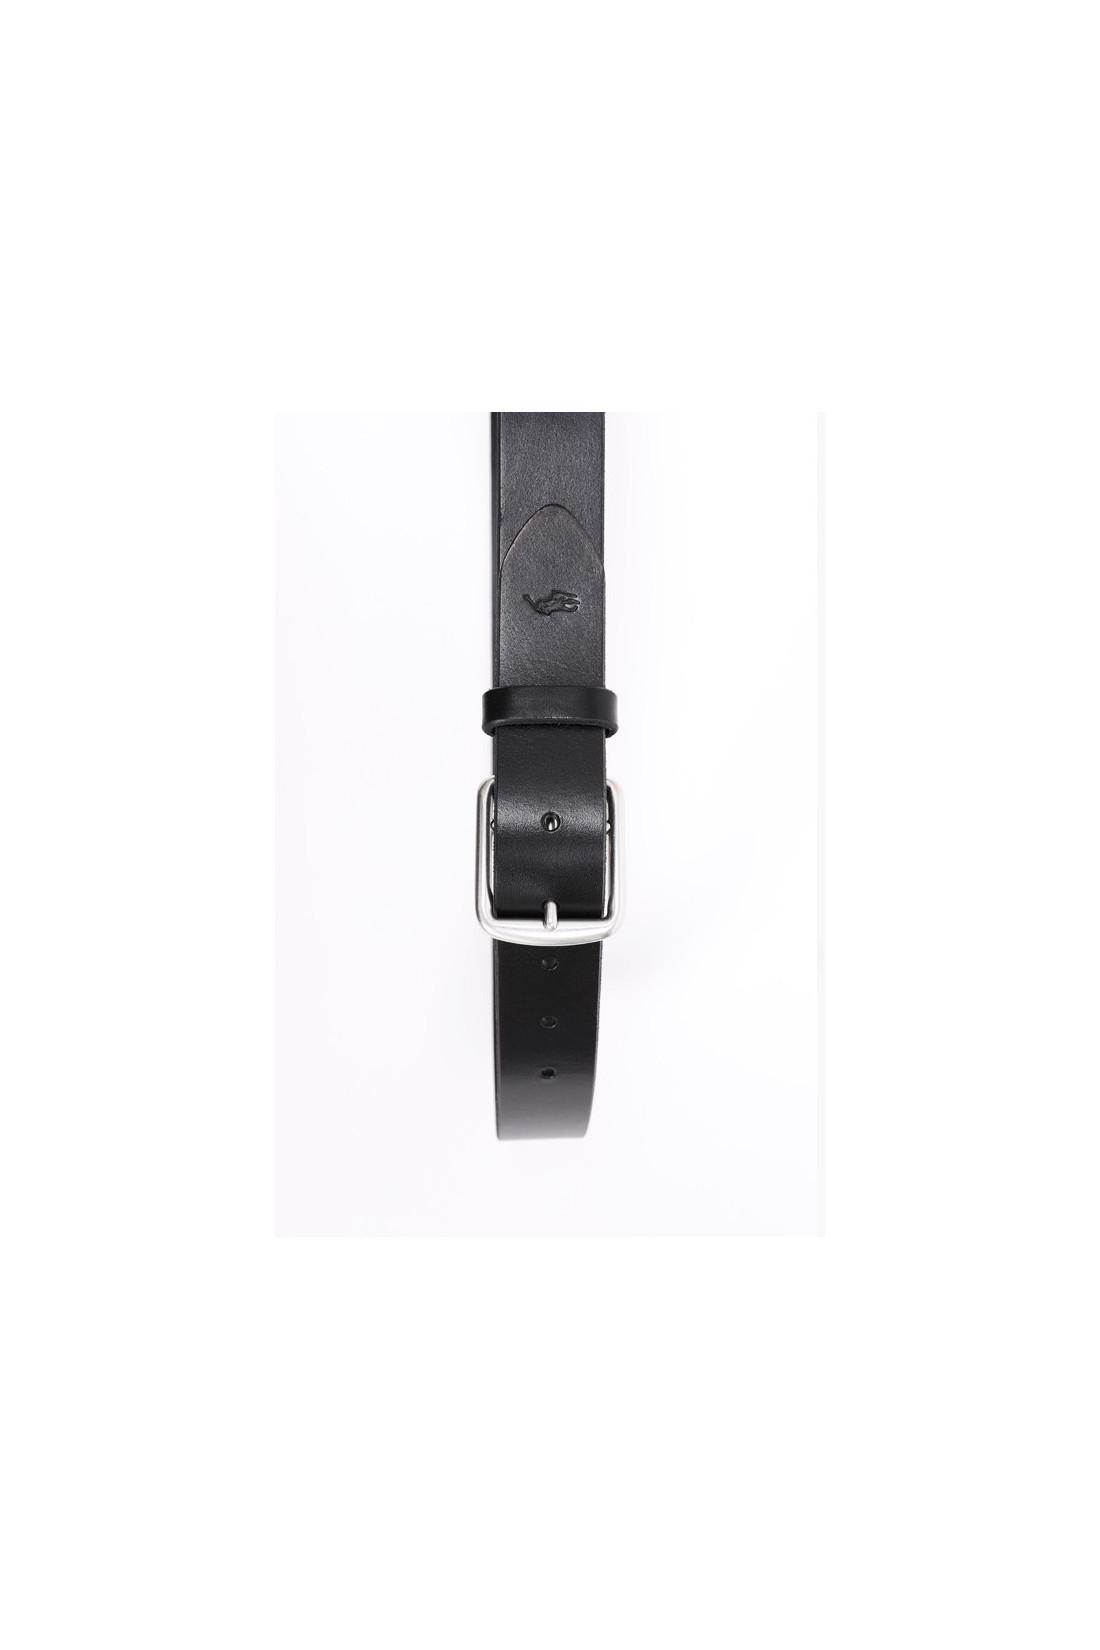 POLO RALPH LAUREN / 3/8 saddlr dress leather Black